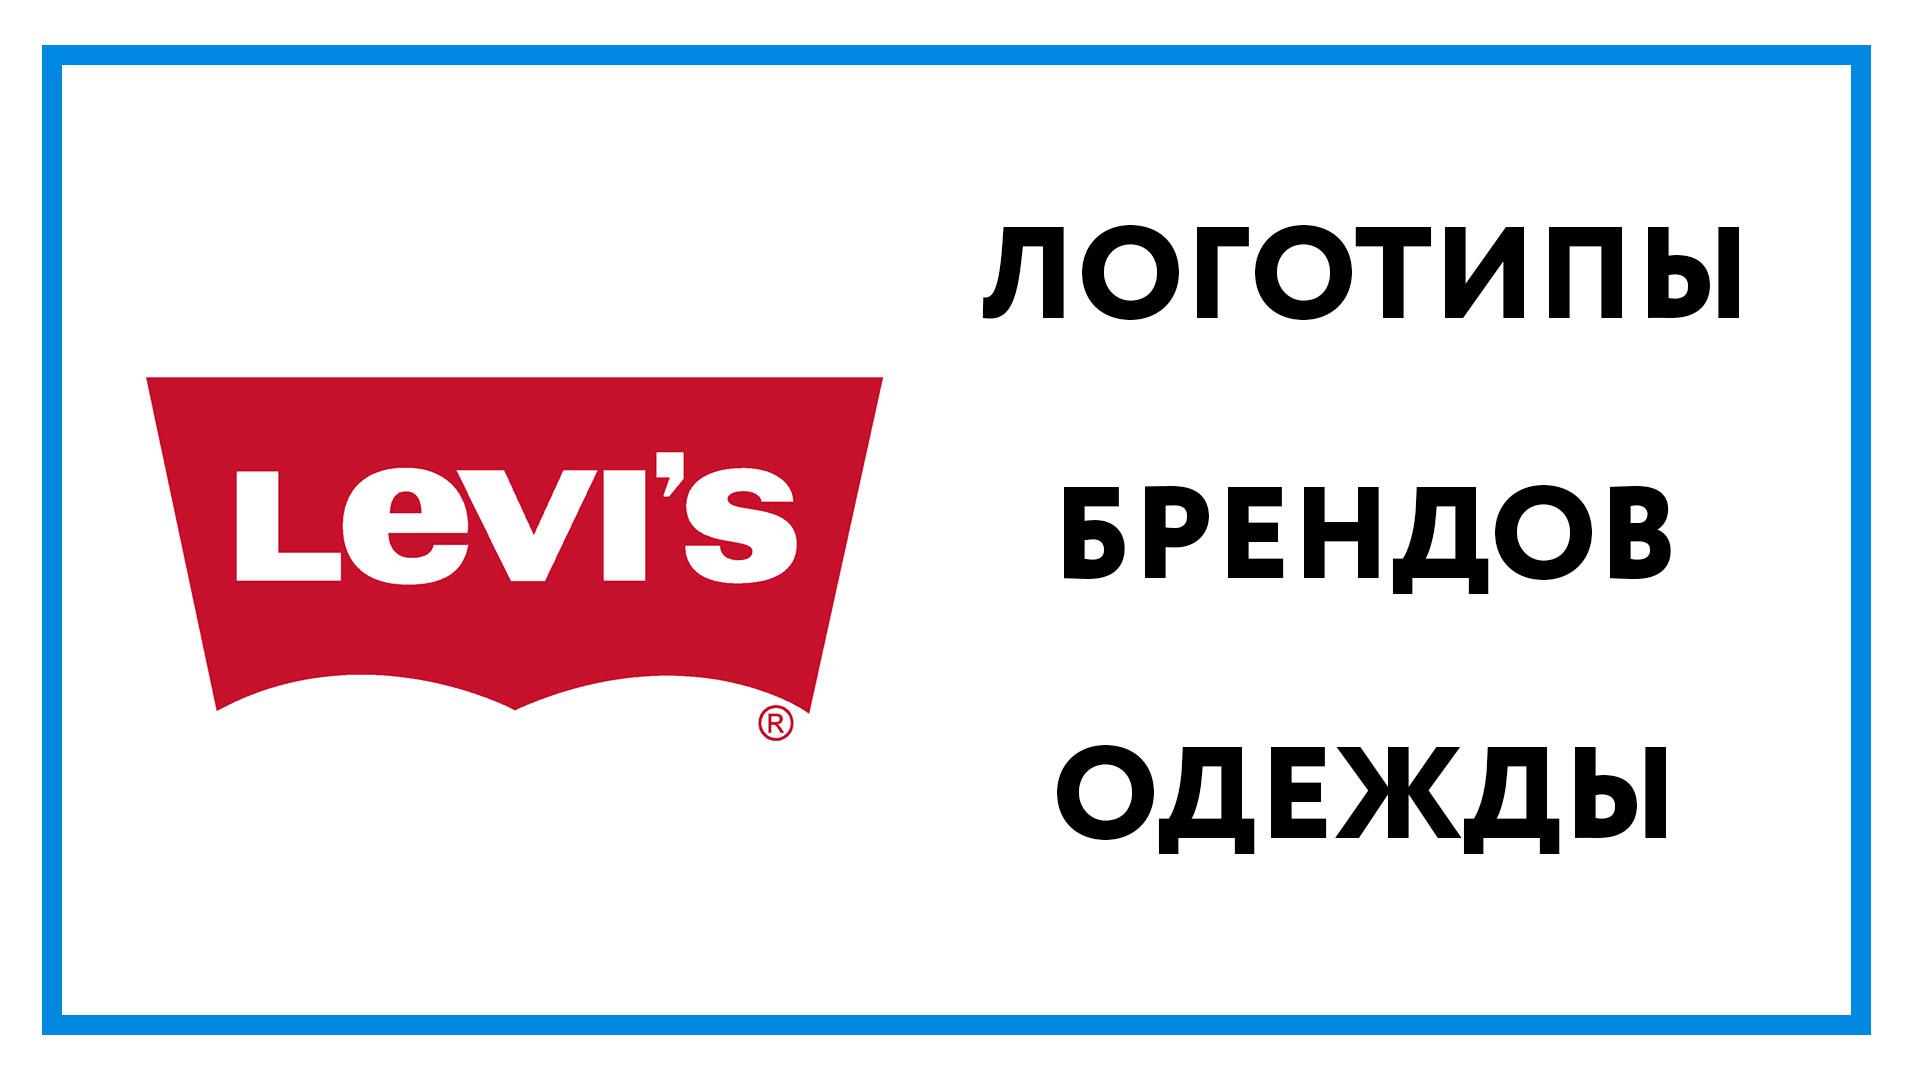 logotip-brendov-odezhdy-foto.jpg